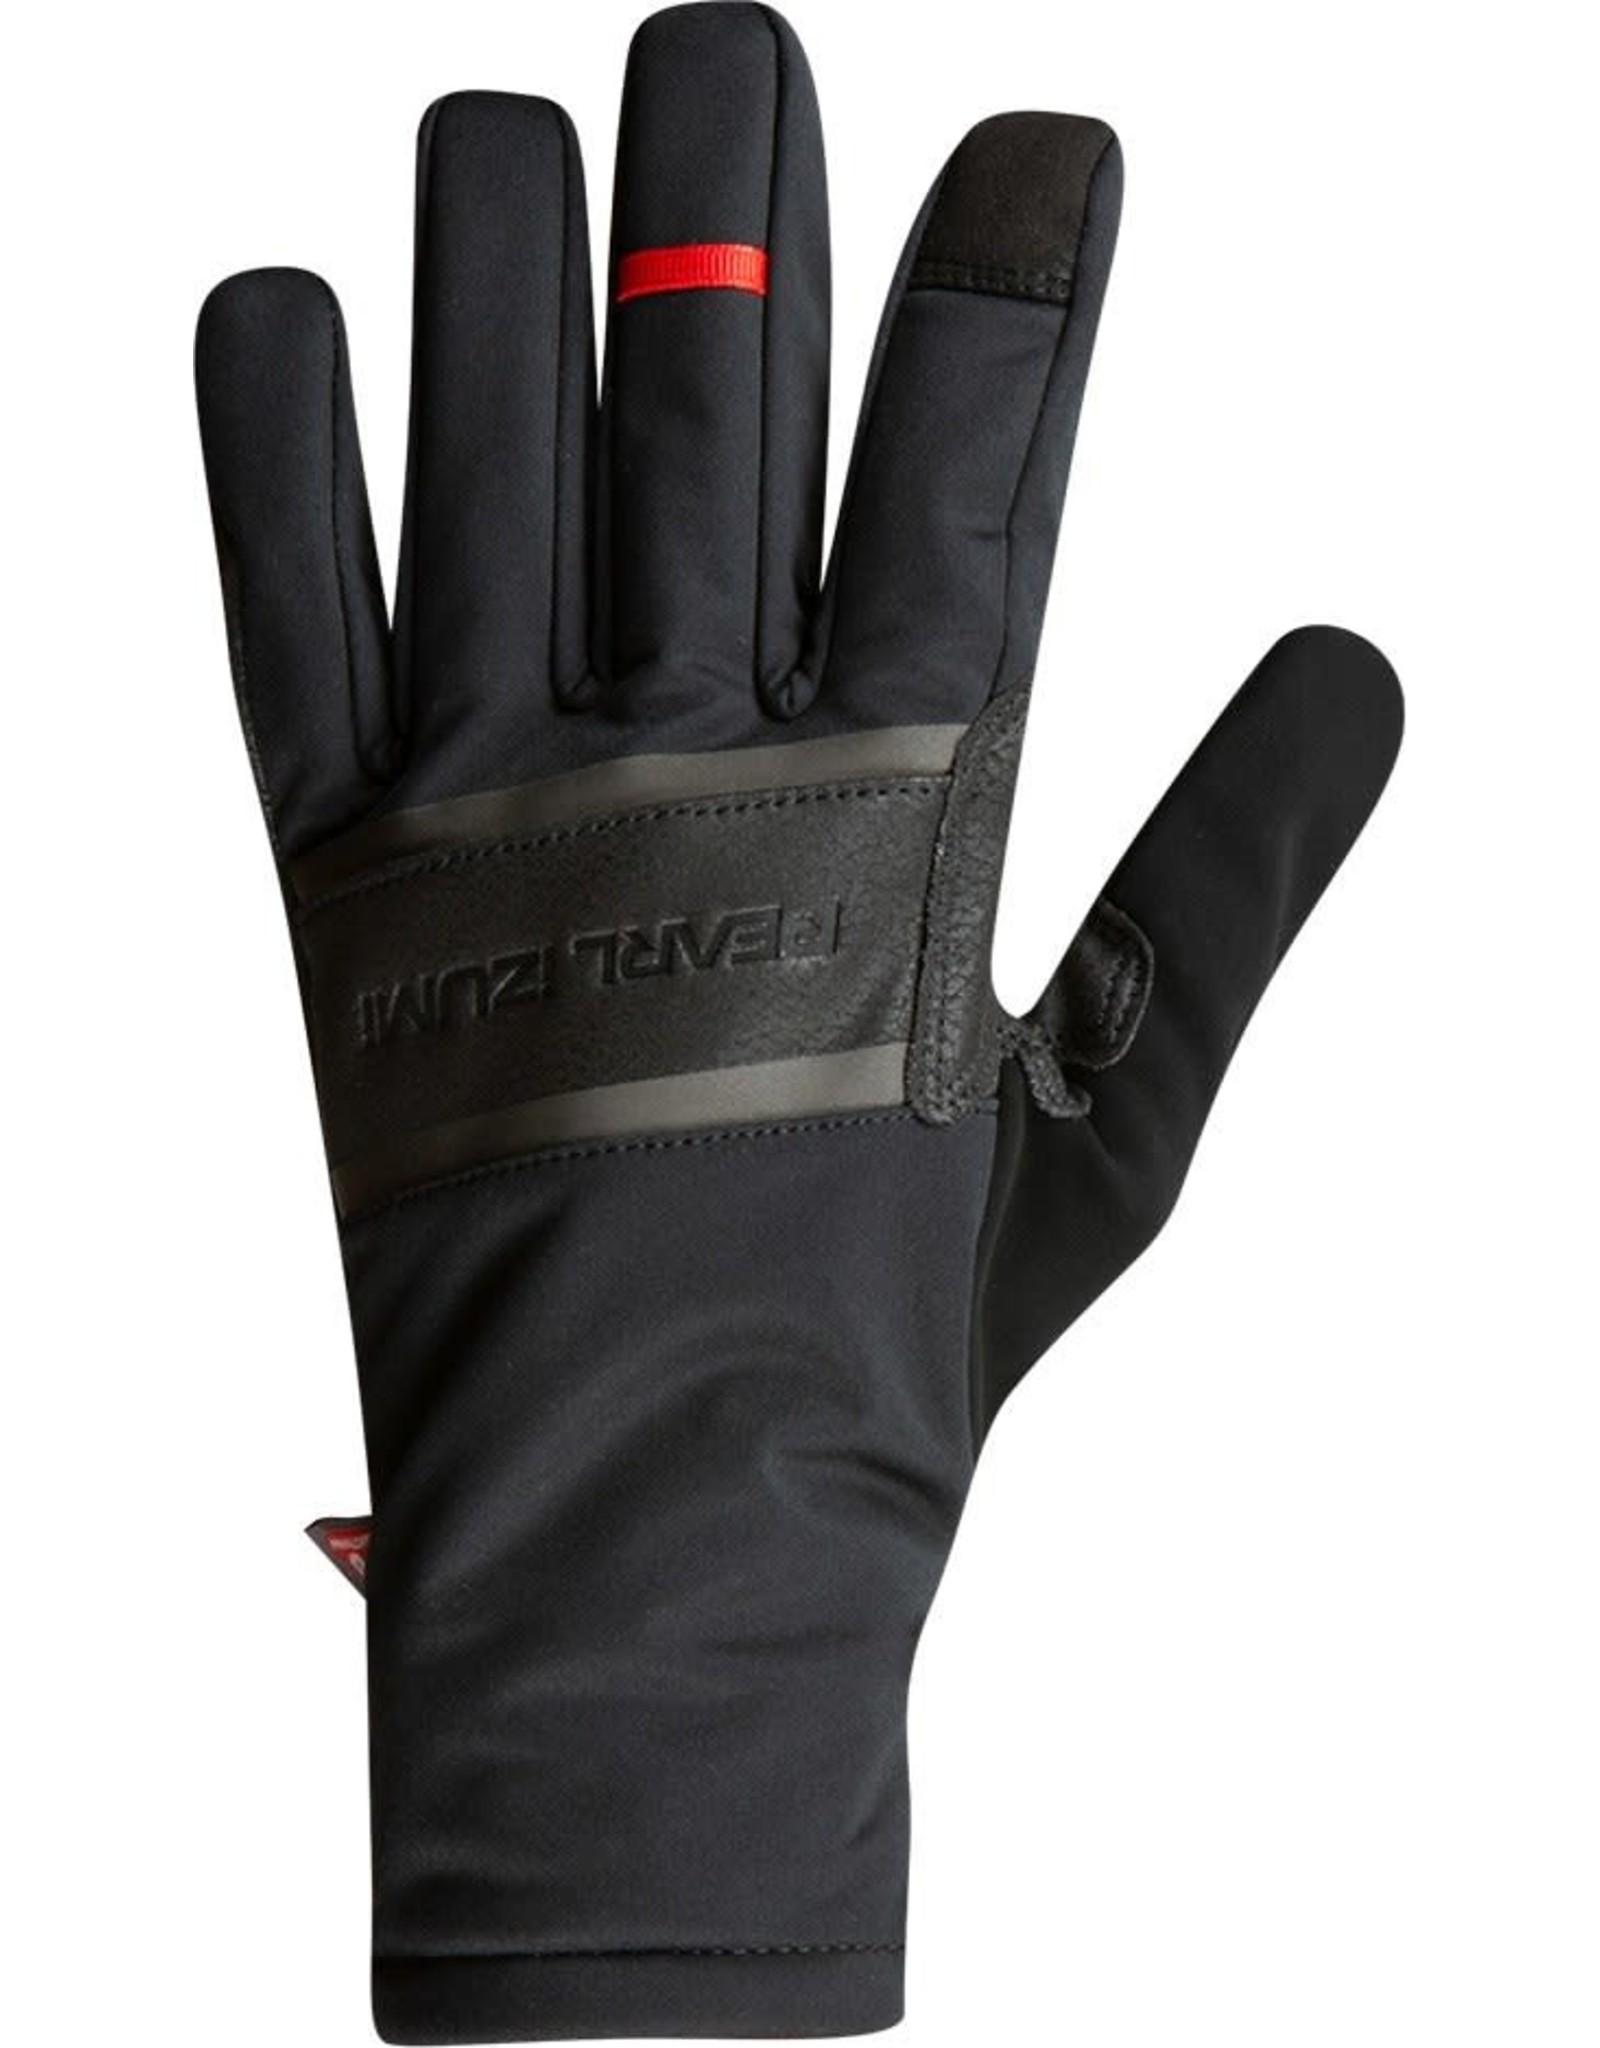 Pearl Izumi AmFib Lite Glove Unisex Black